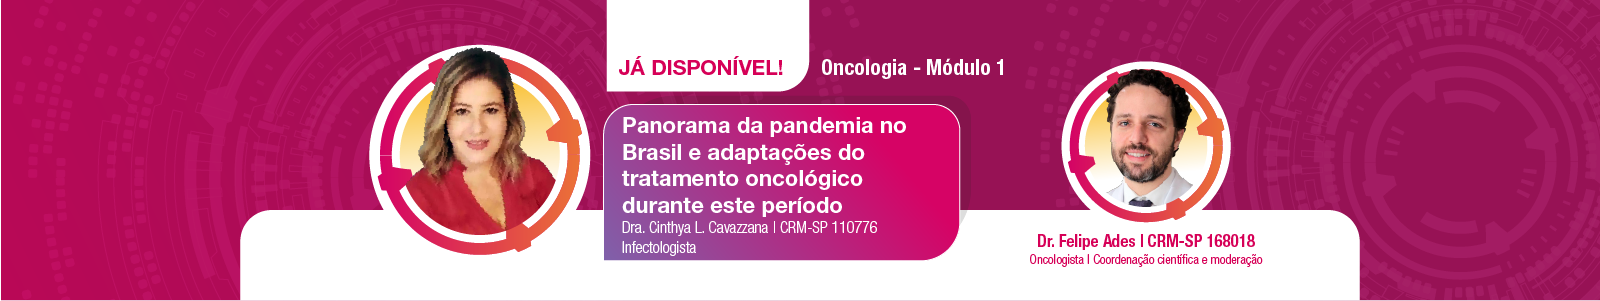 Módulo 1 Oncologia disponível